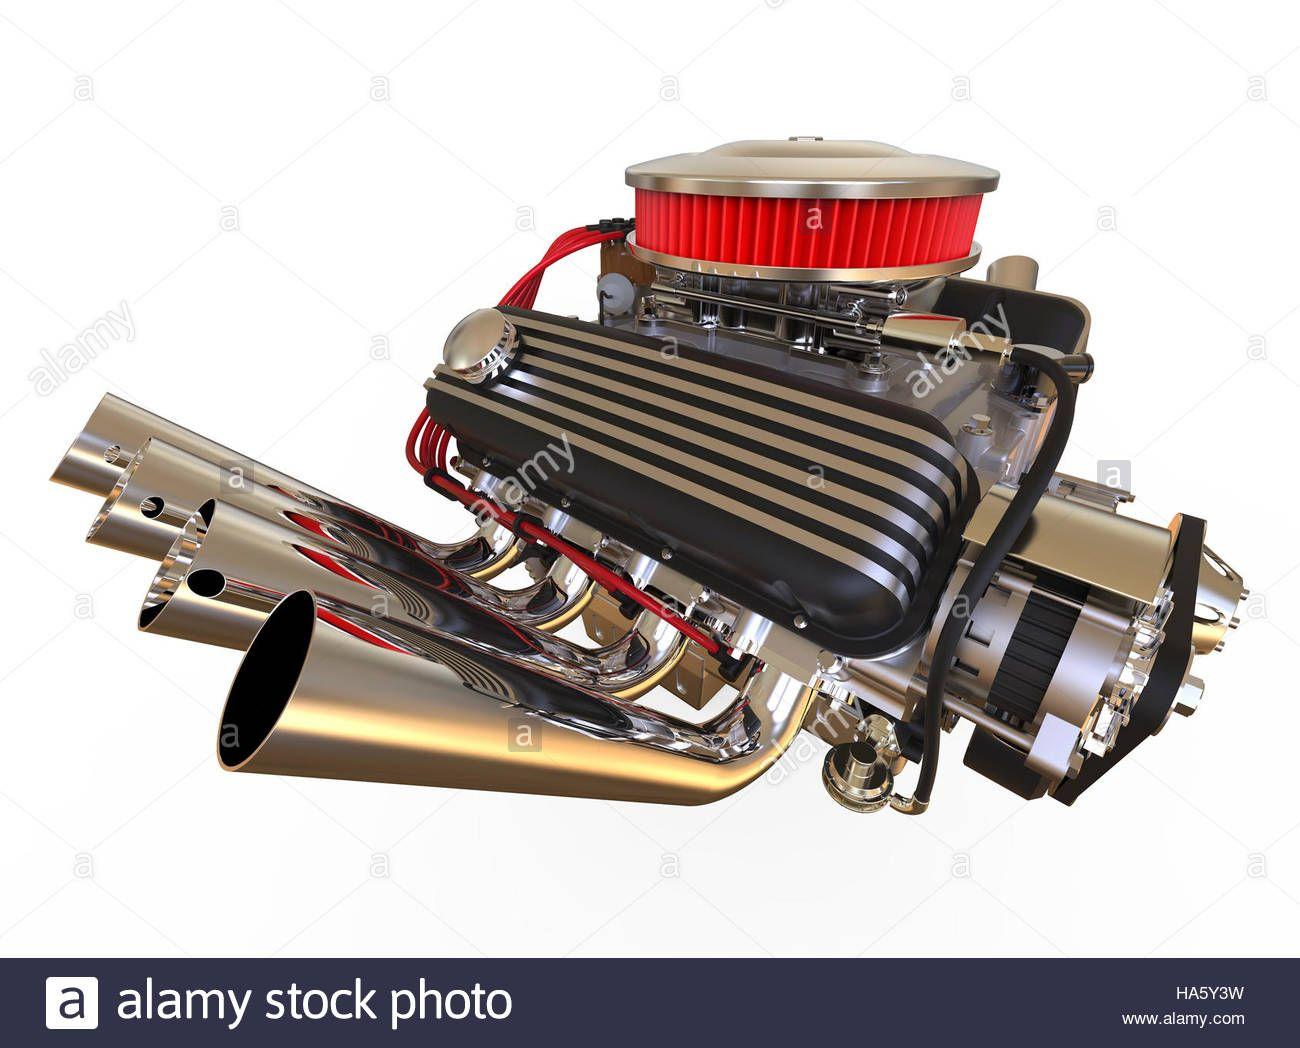 Hot Rod V8 Engine 3d Render Stock Photo, Royalty Free Image: 126750173 - Alamy